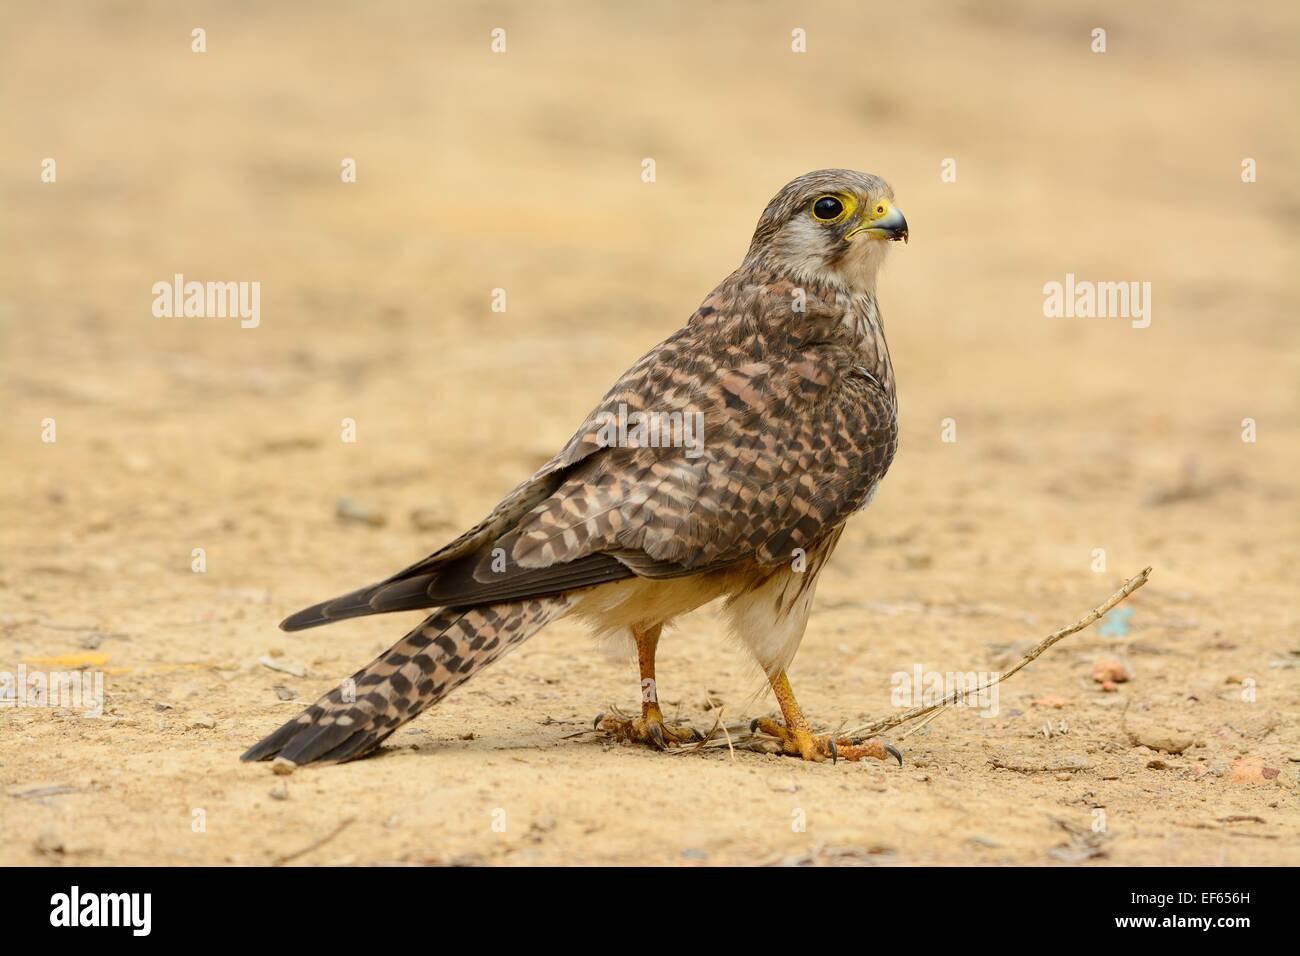 beautiful female Common Kestrel (Falco tinnunculus) standing on ground - Stock Image